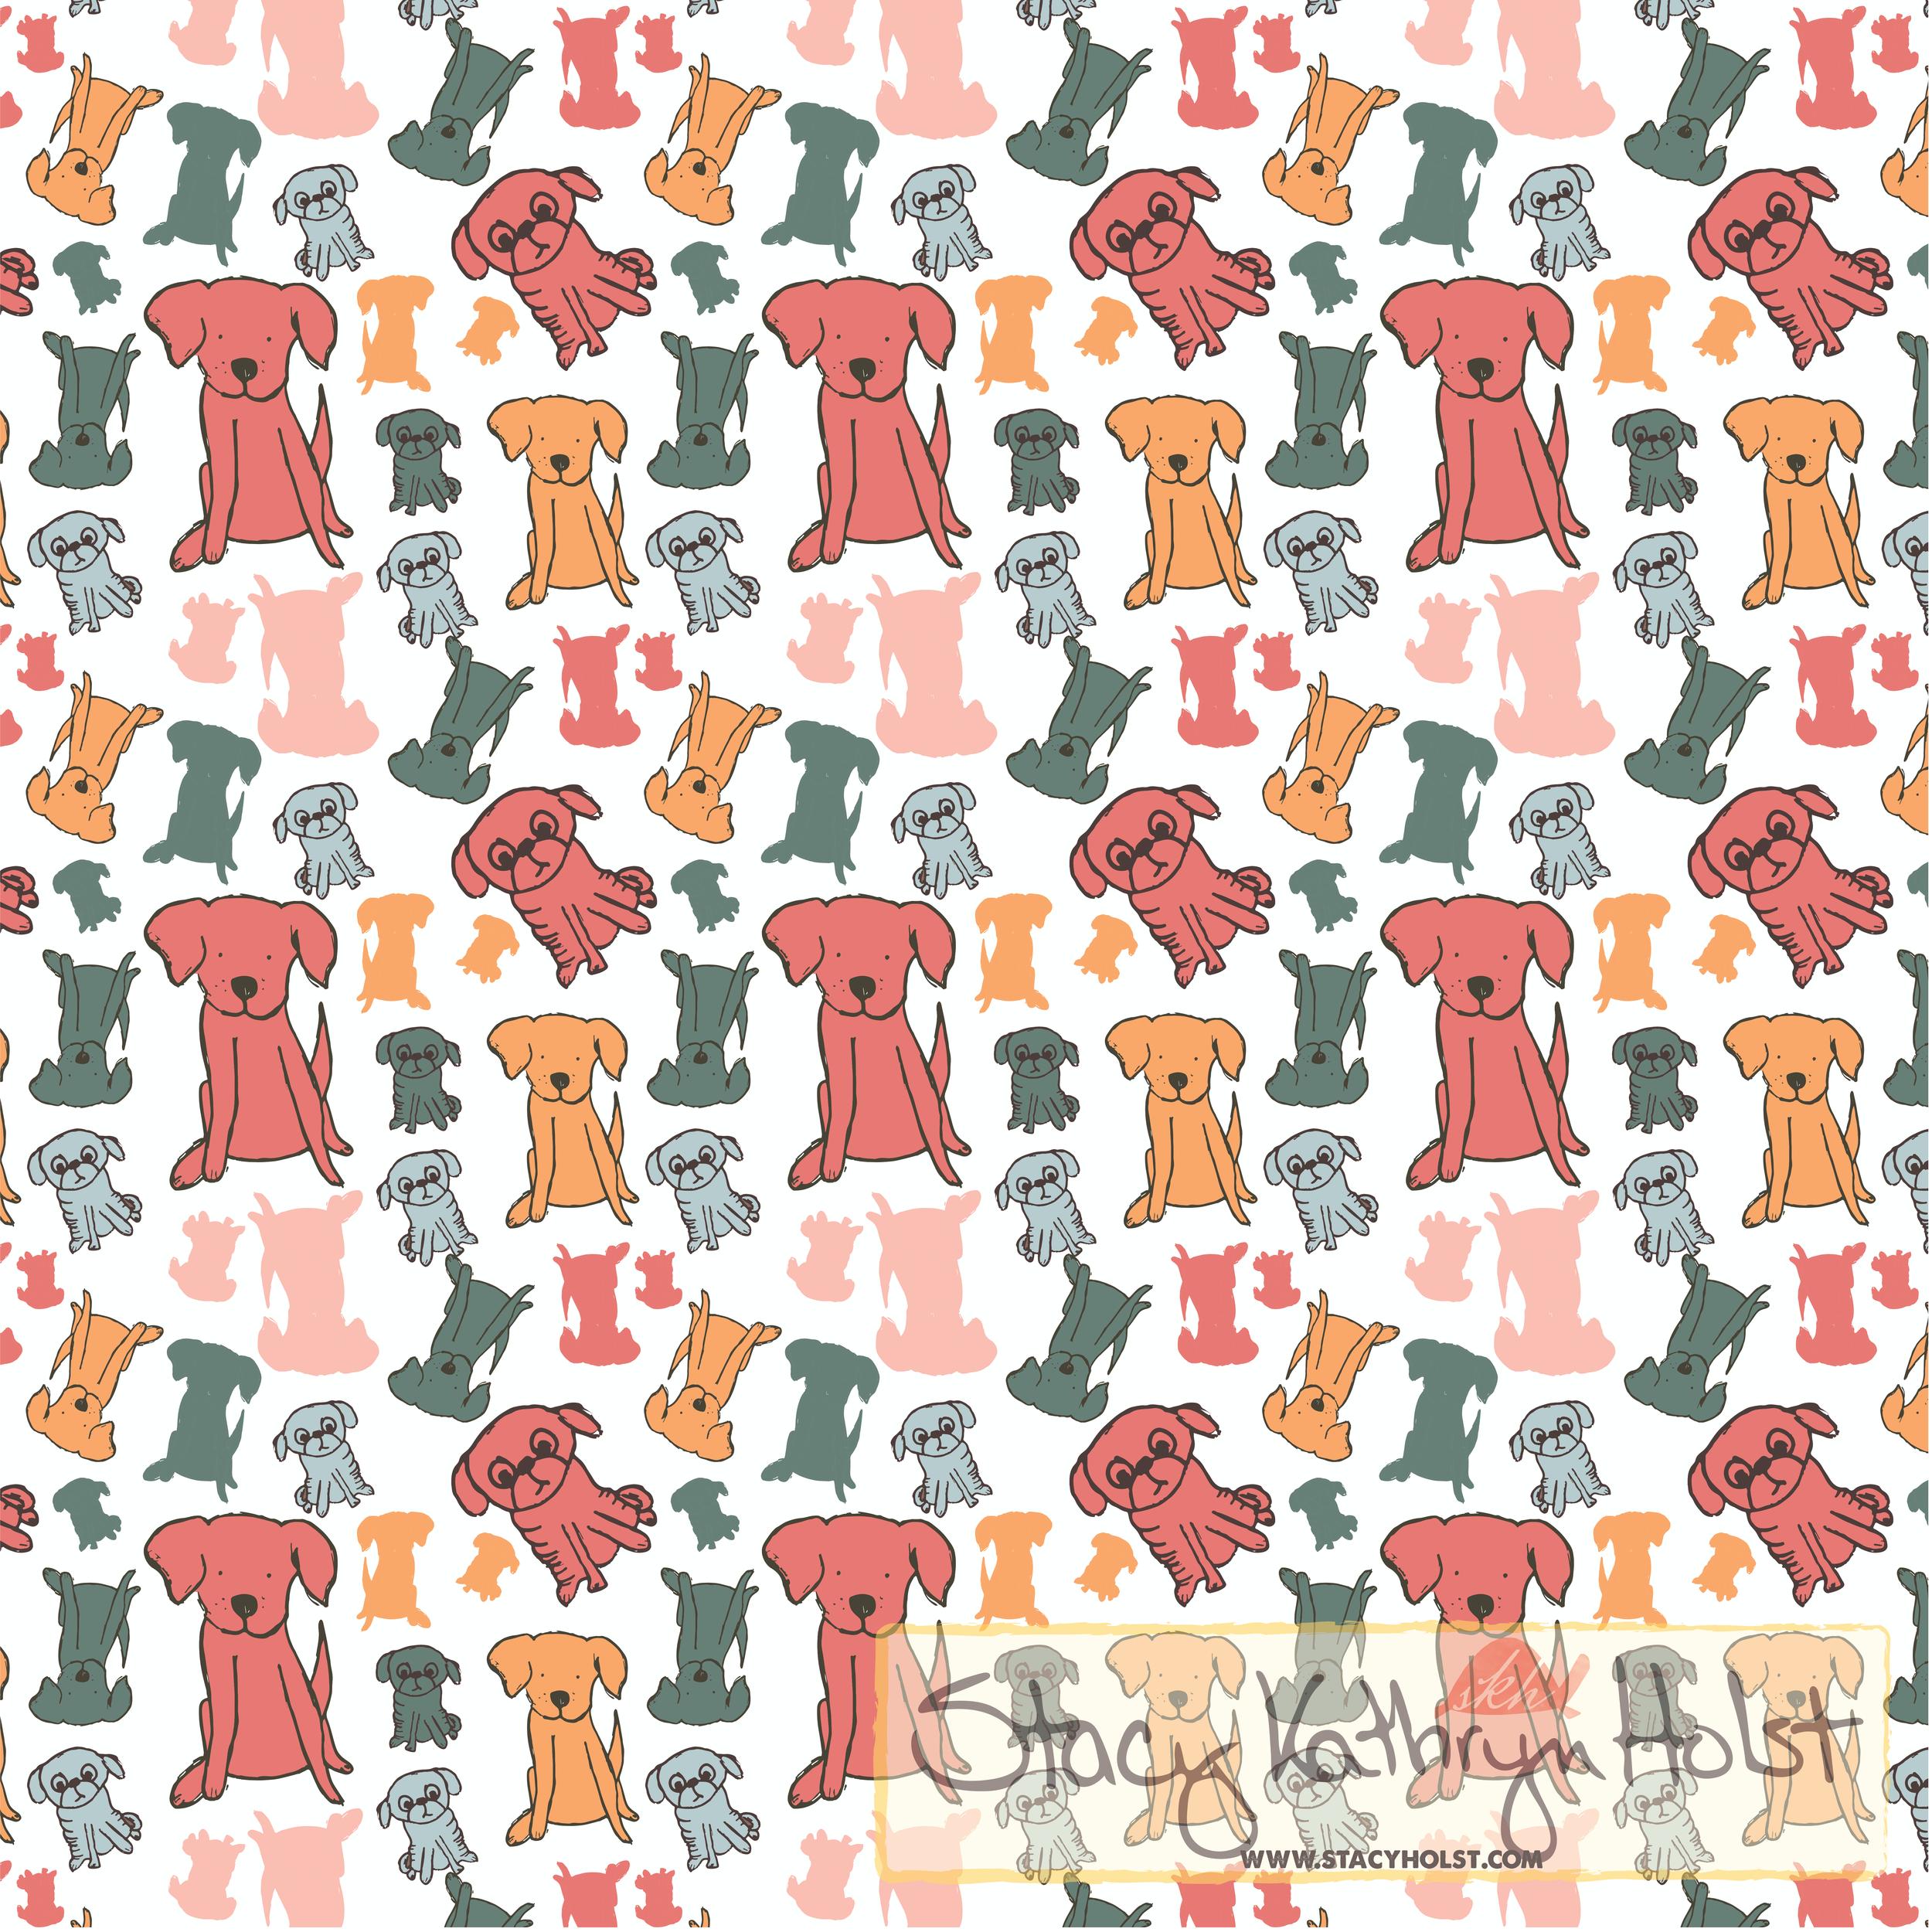 Dogs-PugsandLabs_Artboard 4.png